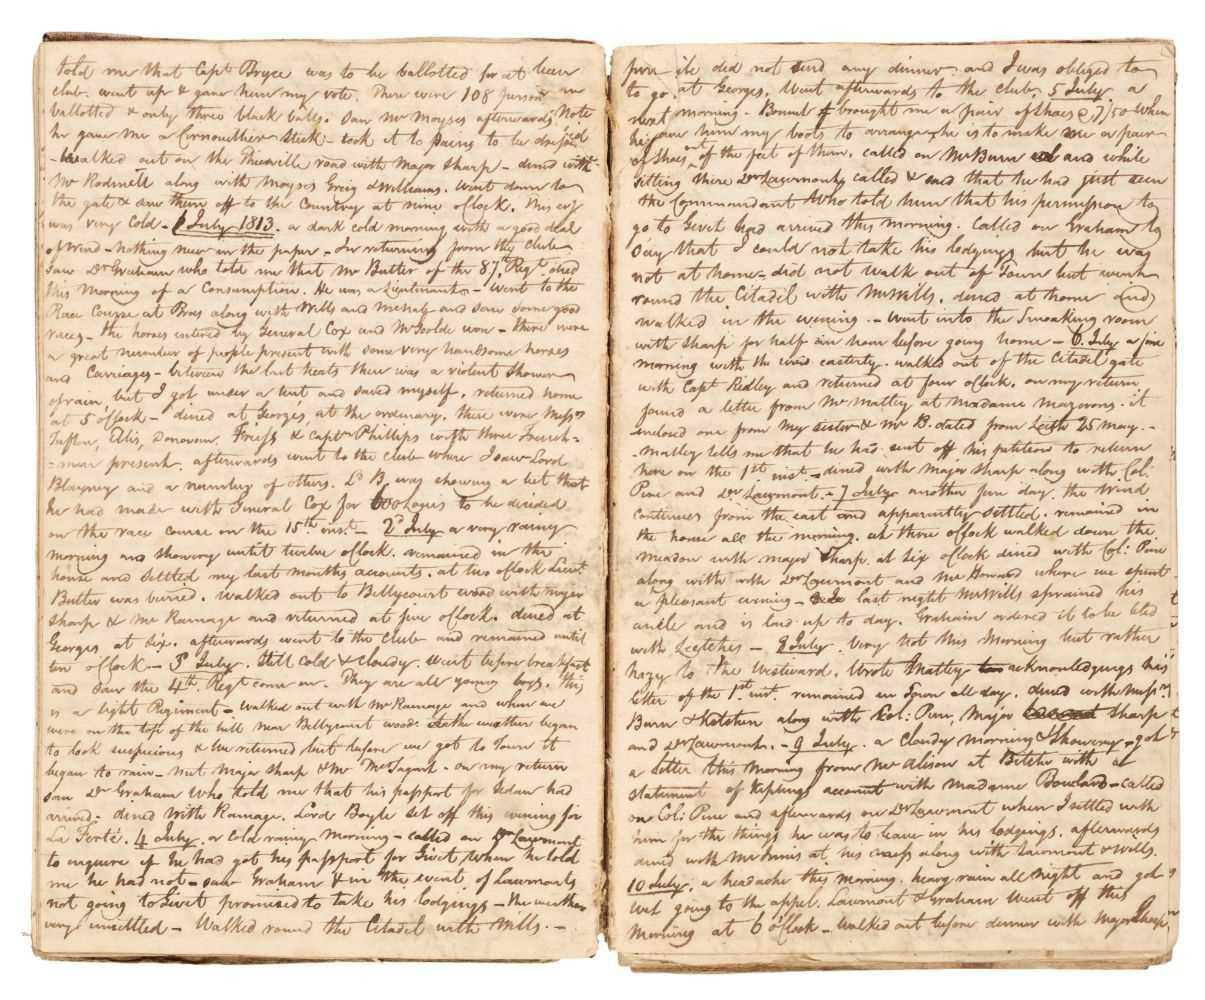 Lot 282 - Napoleonic Prisoner-of-War Diary. 1812-1814